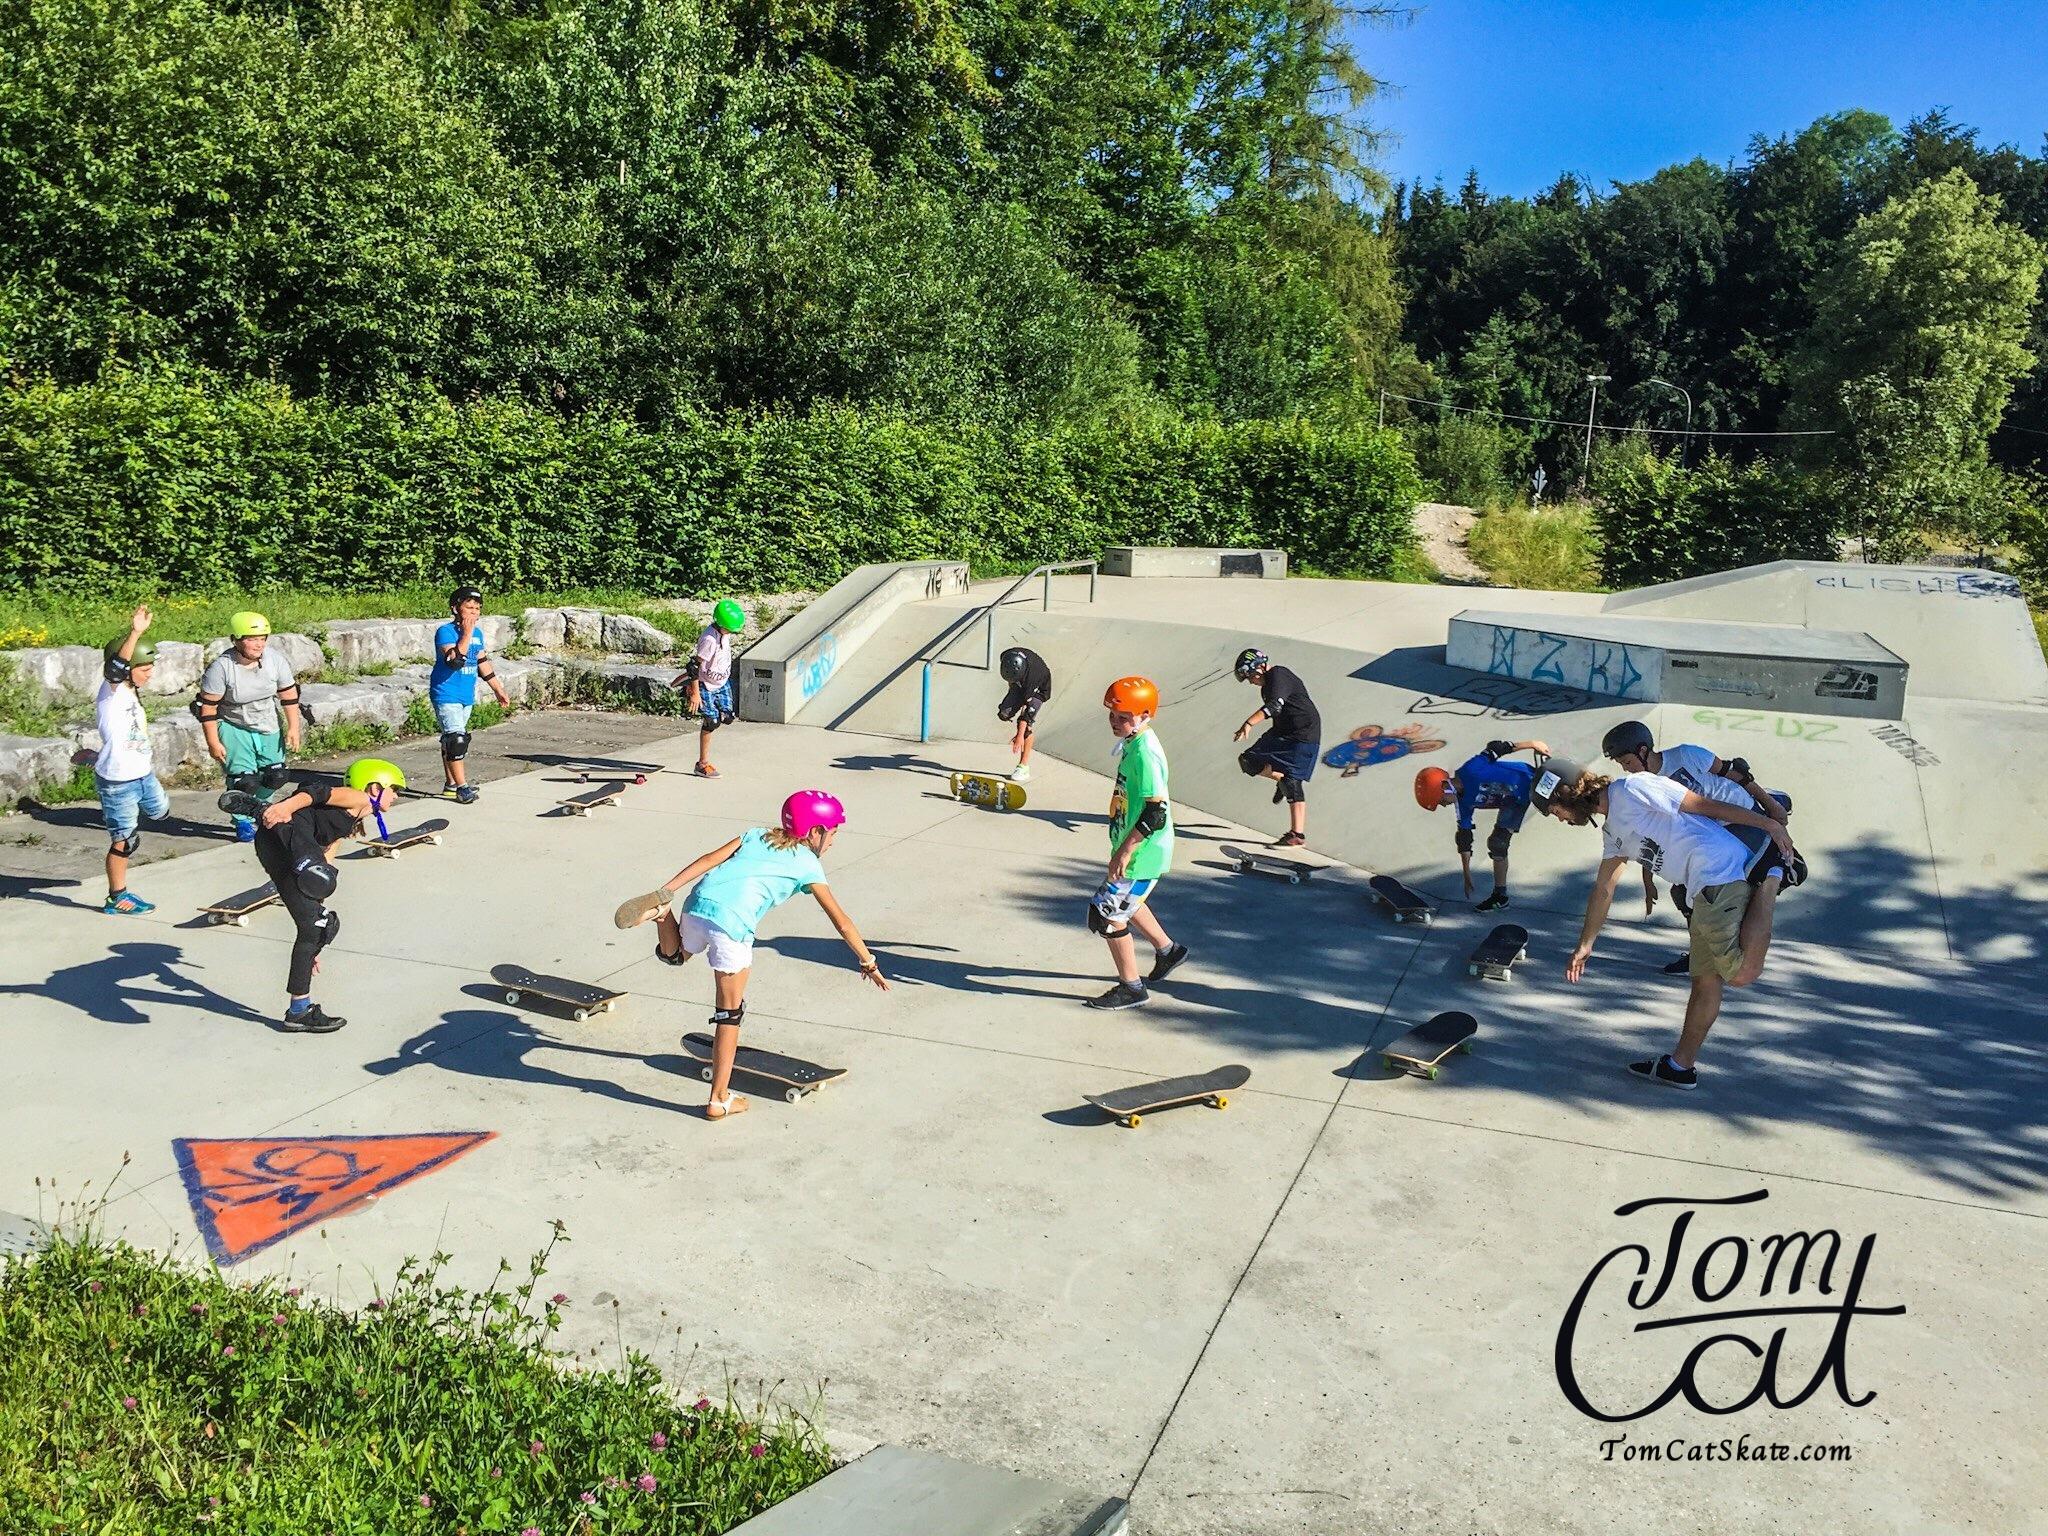 Skatekurs Bad Tölz Skaten Lernen mit Profi Tom Cat auch Longboardkurse im raum München, Bad Tölz, Lenggries  3.JPG